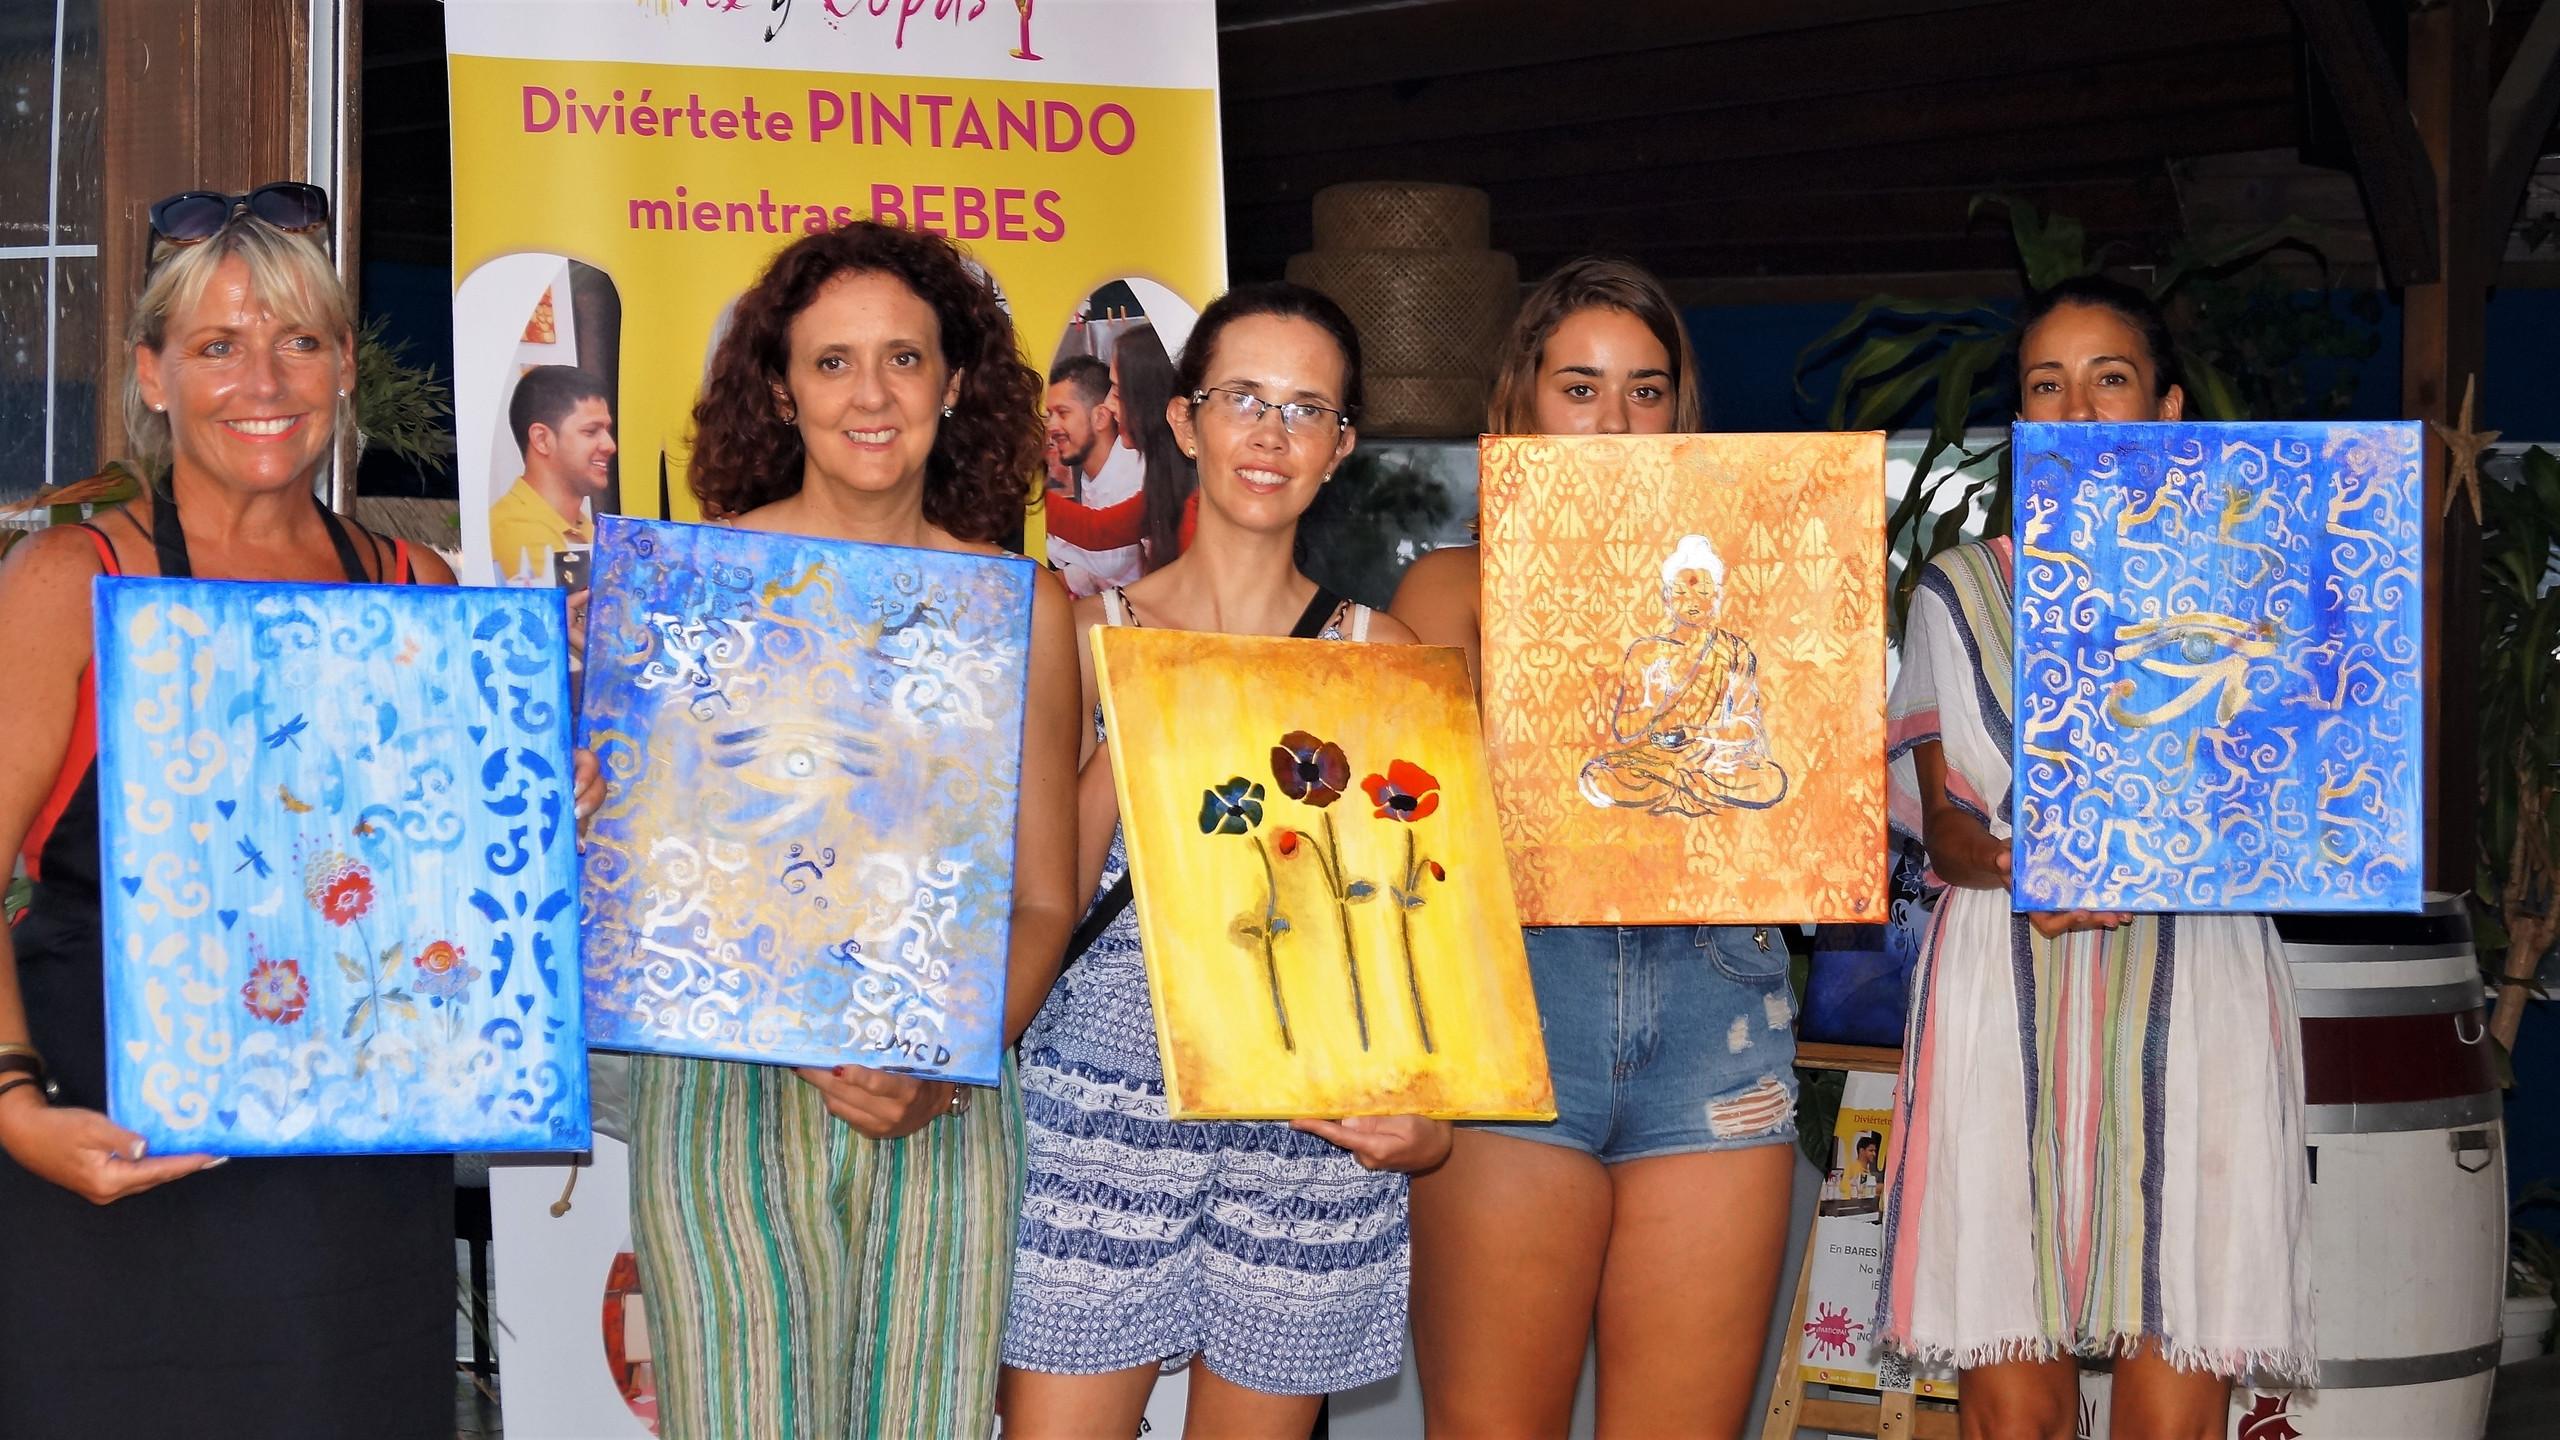 003-ARTEyCOPAS-Evento-La-Gustosa-23-08-2017-9626